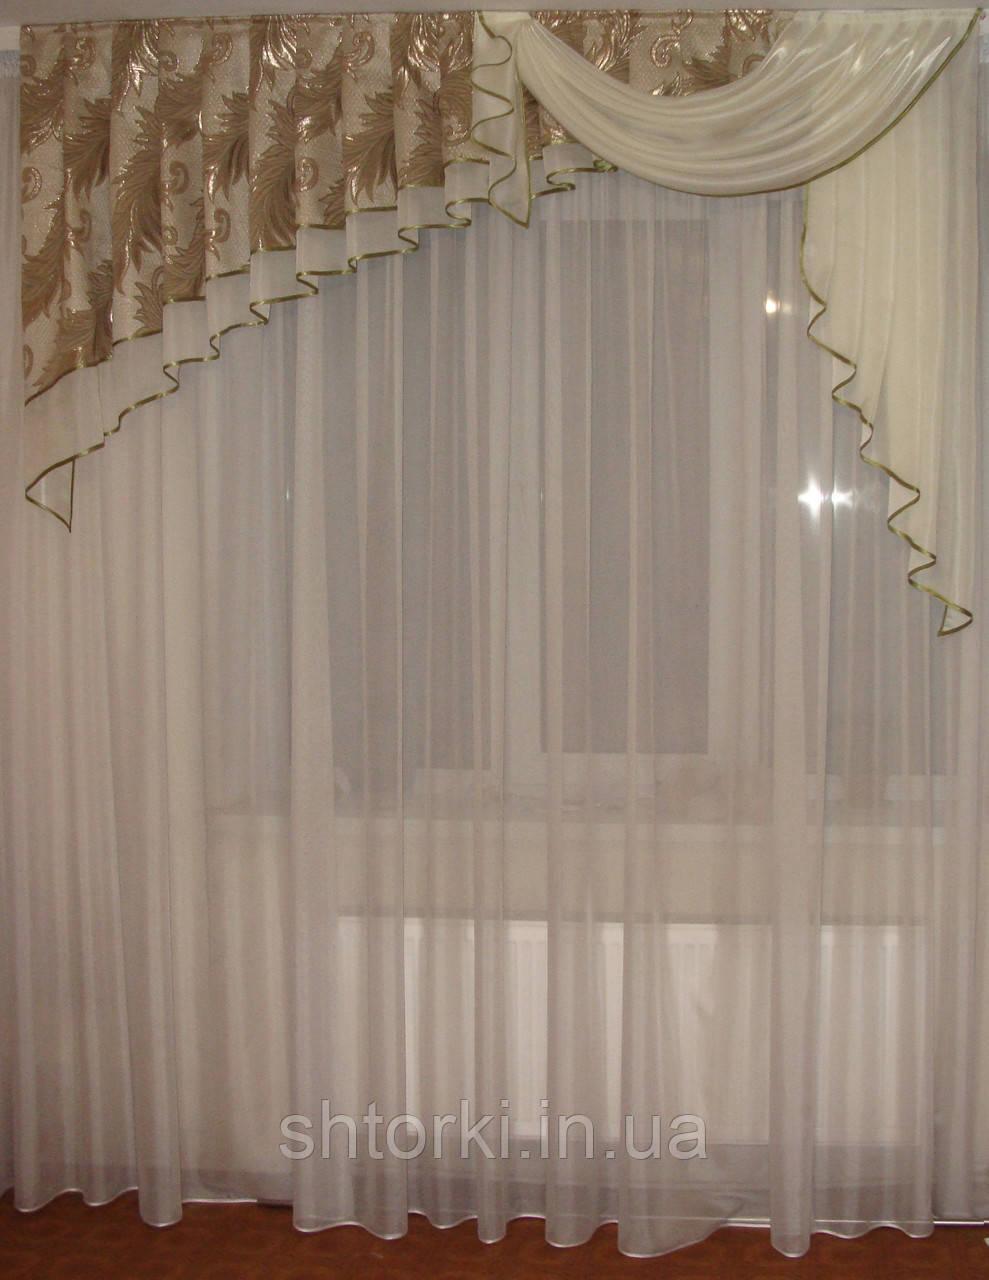 Ламбрикен Ассиметрия 2м оливковобежевый